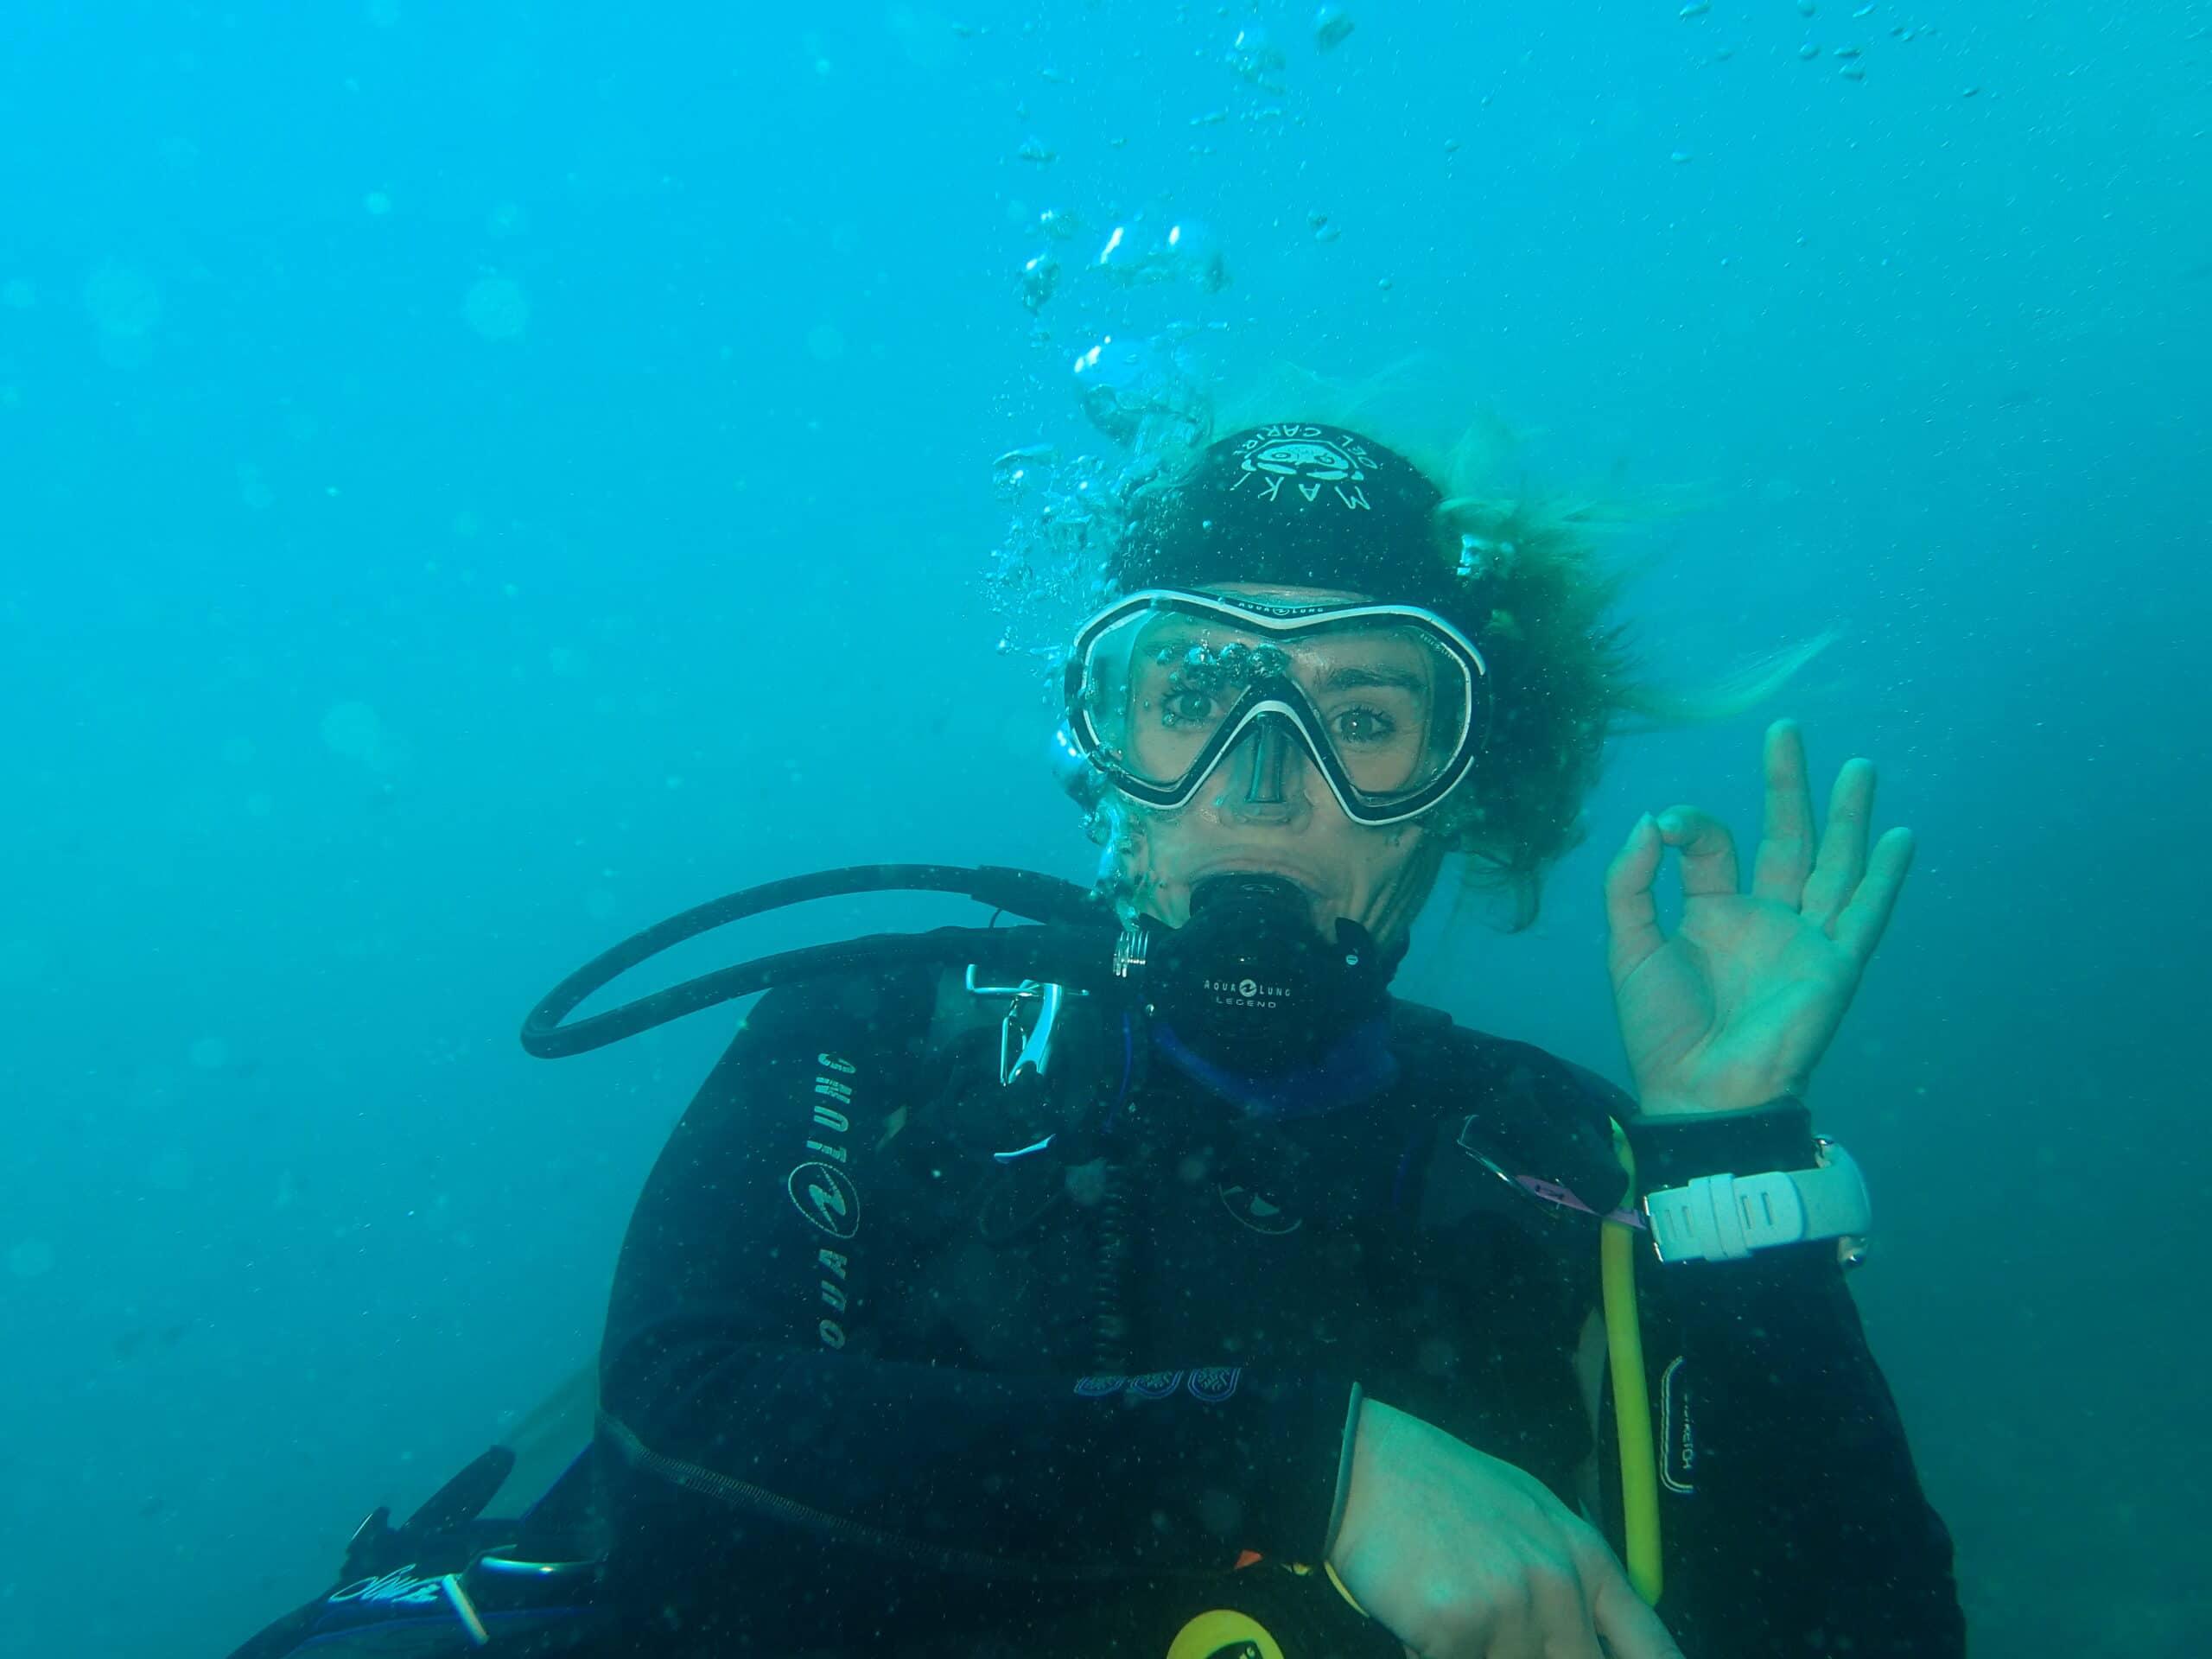 vidage de masque en plongée